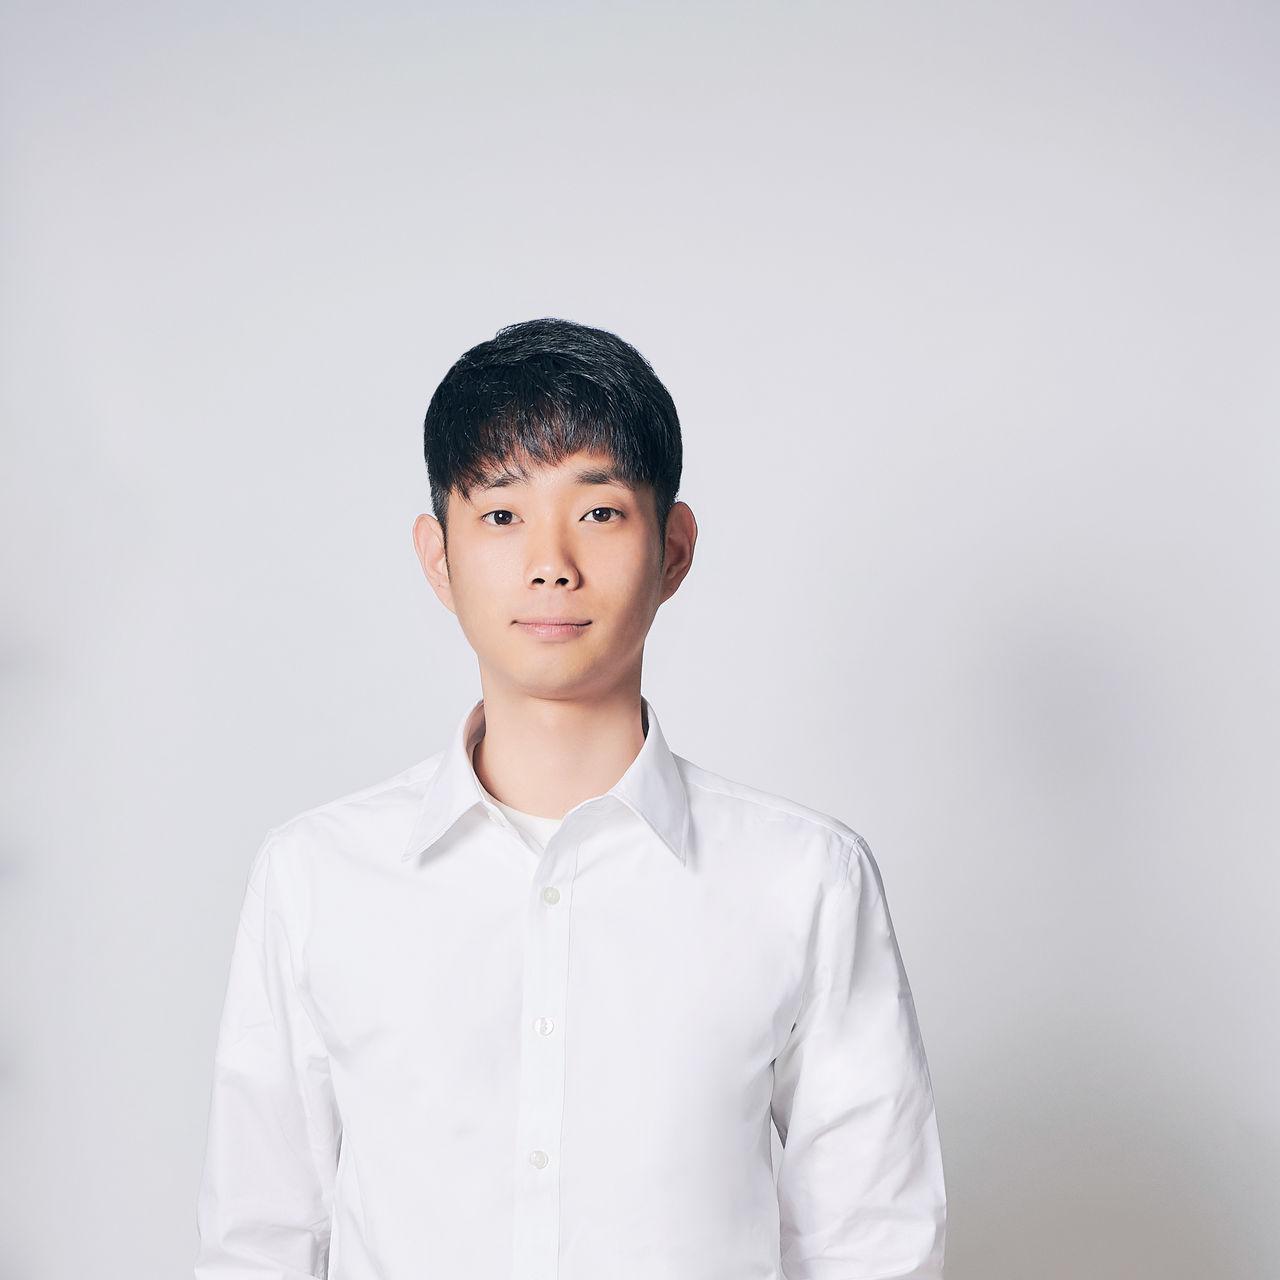 <b>Kim Woo Yeong</b><br>Lead Fundraiser<br>